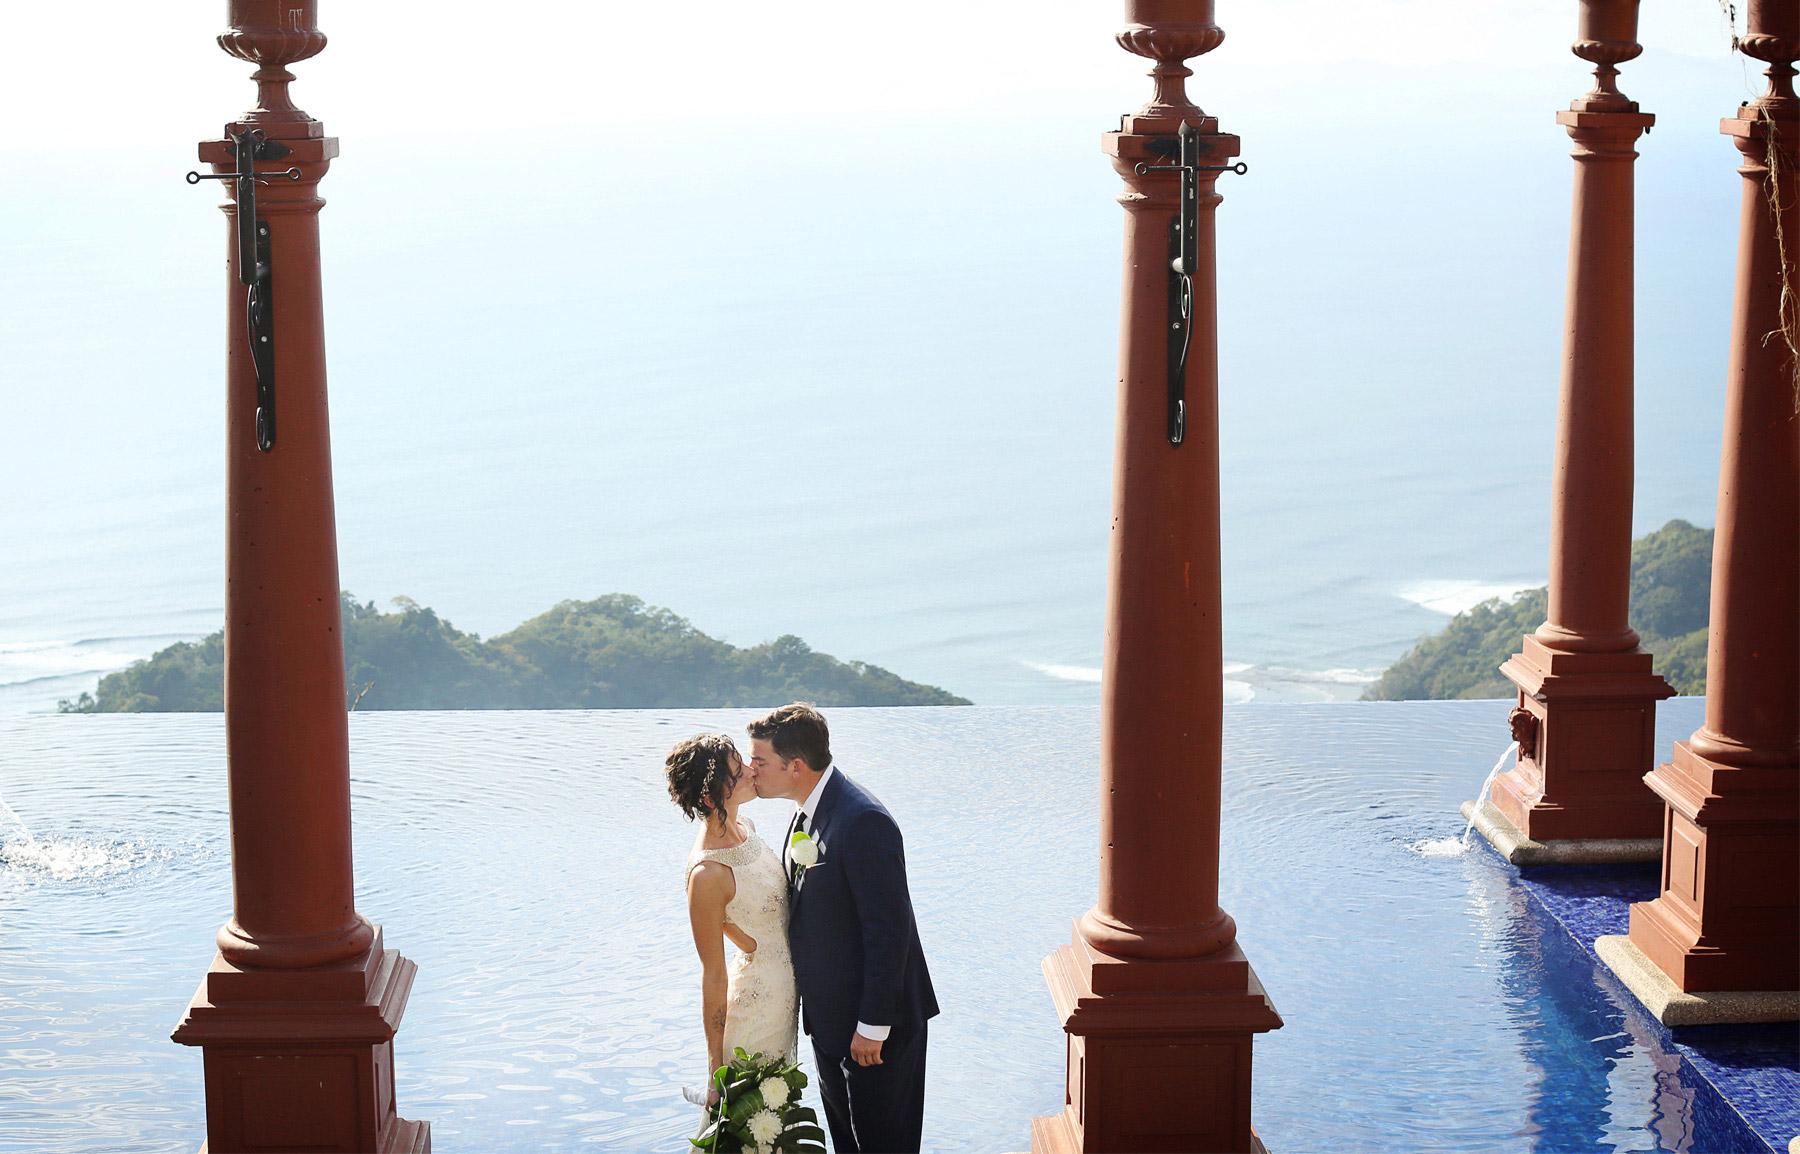 10-Costa-Rica-Wedding-Photography-by-Vick-Photography-Jaco-Tropical-Beach-Villa-Caletas-Resort-Ocean-View-Alli-and-Duncan.jpg